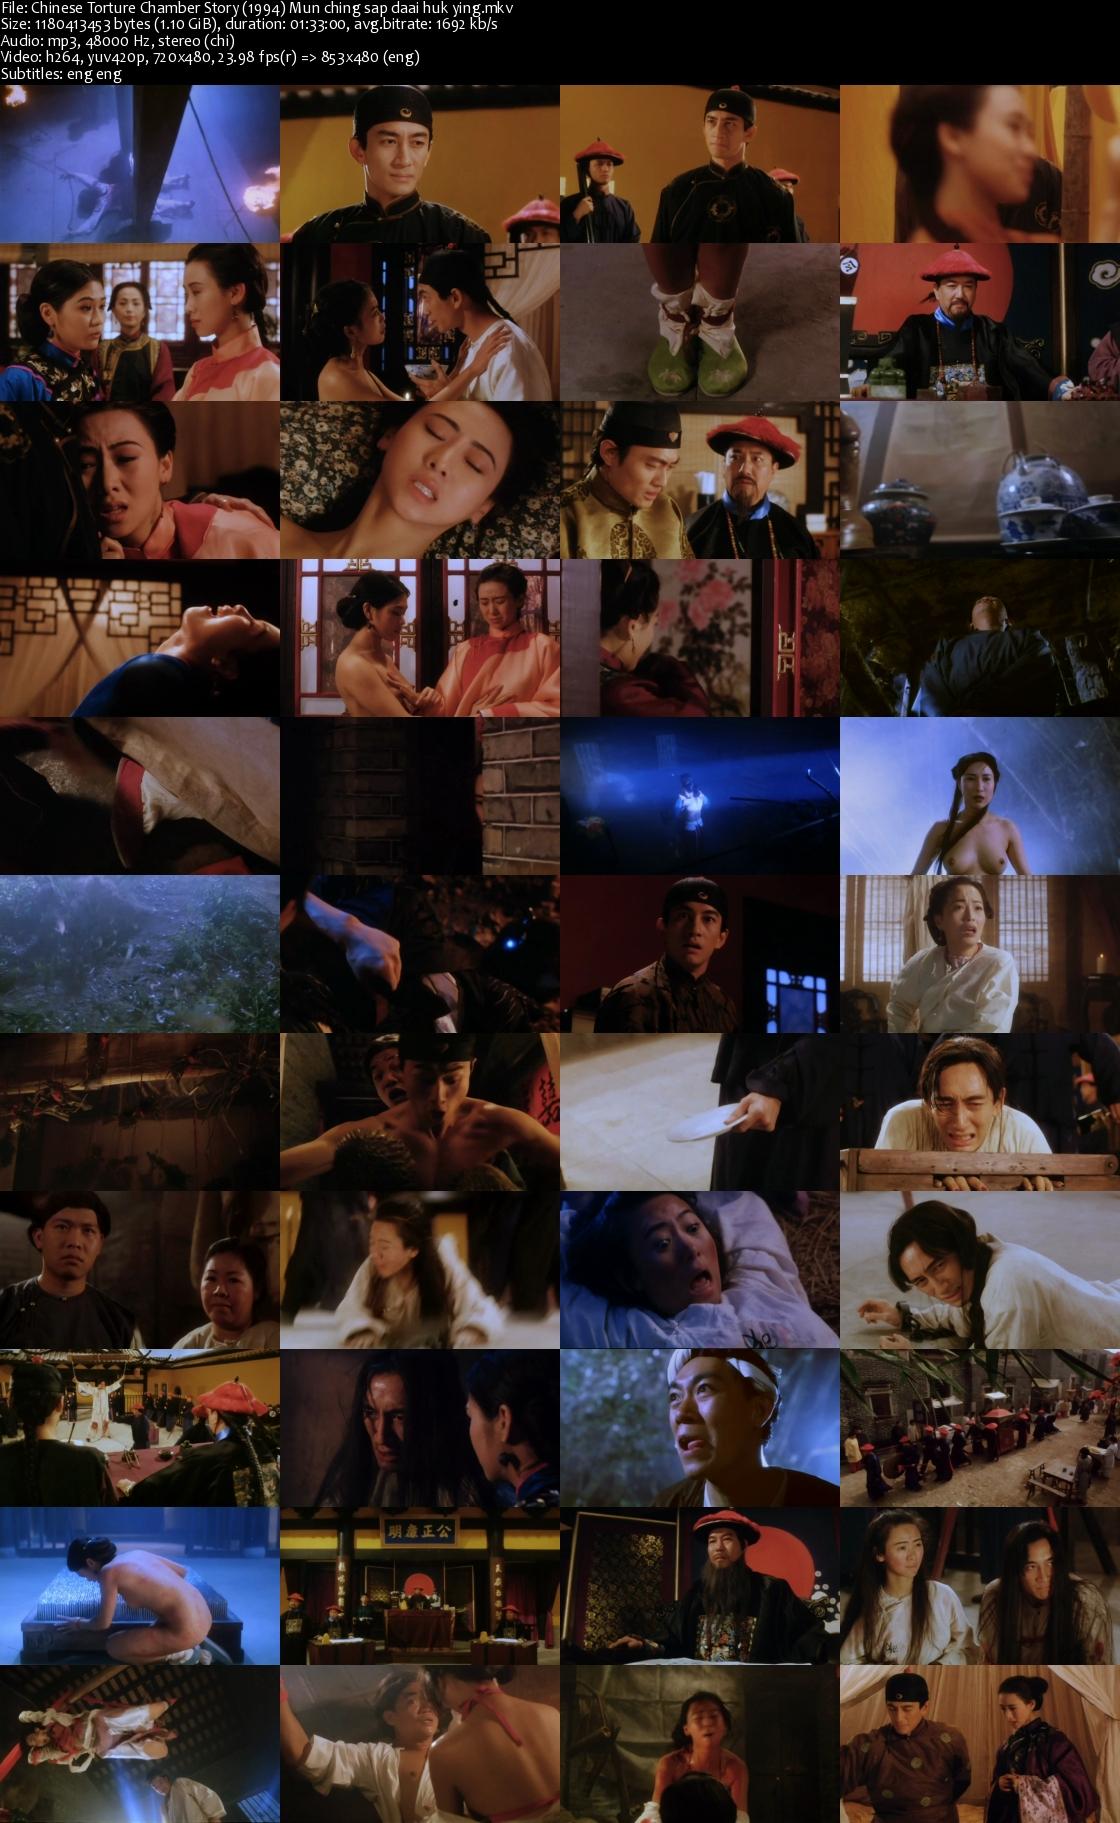 Ancient Chine Torture Porn chinese torture chamber story (1994) dvdrip [1.10gb] mun